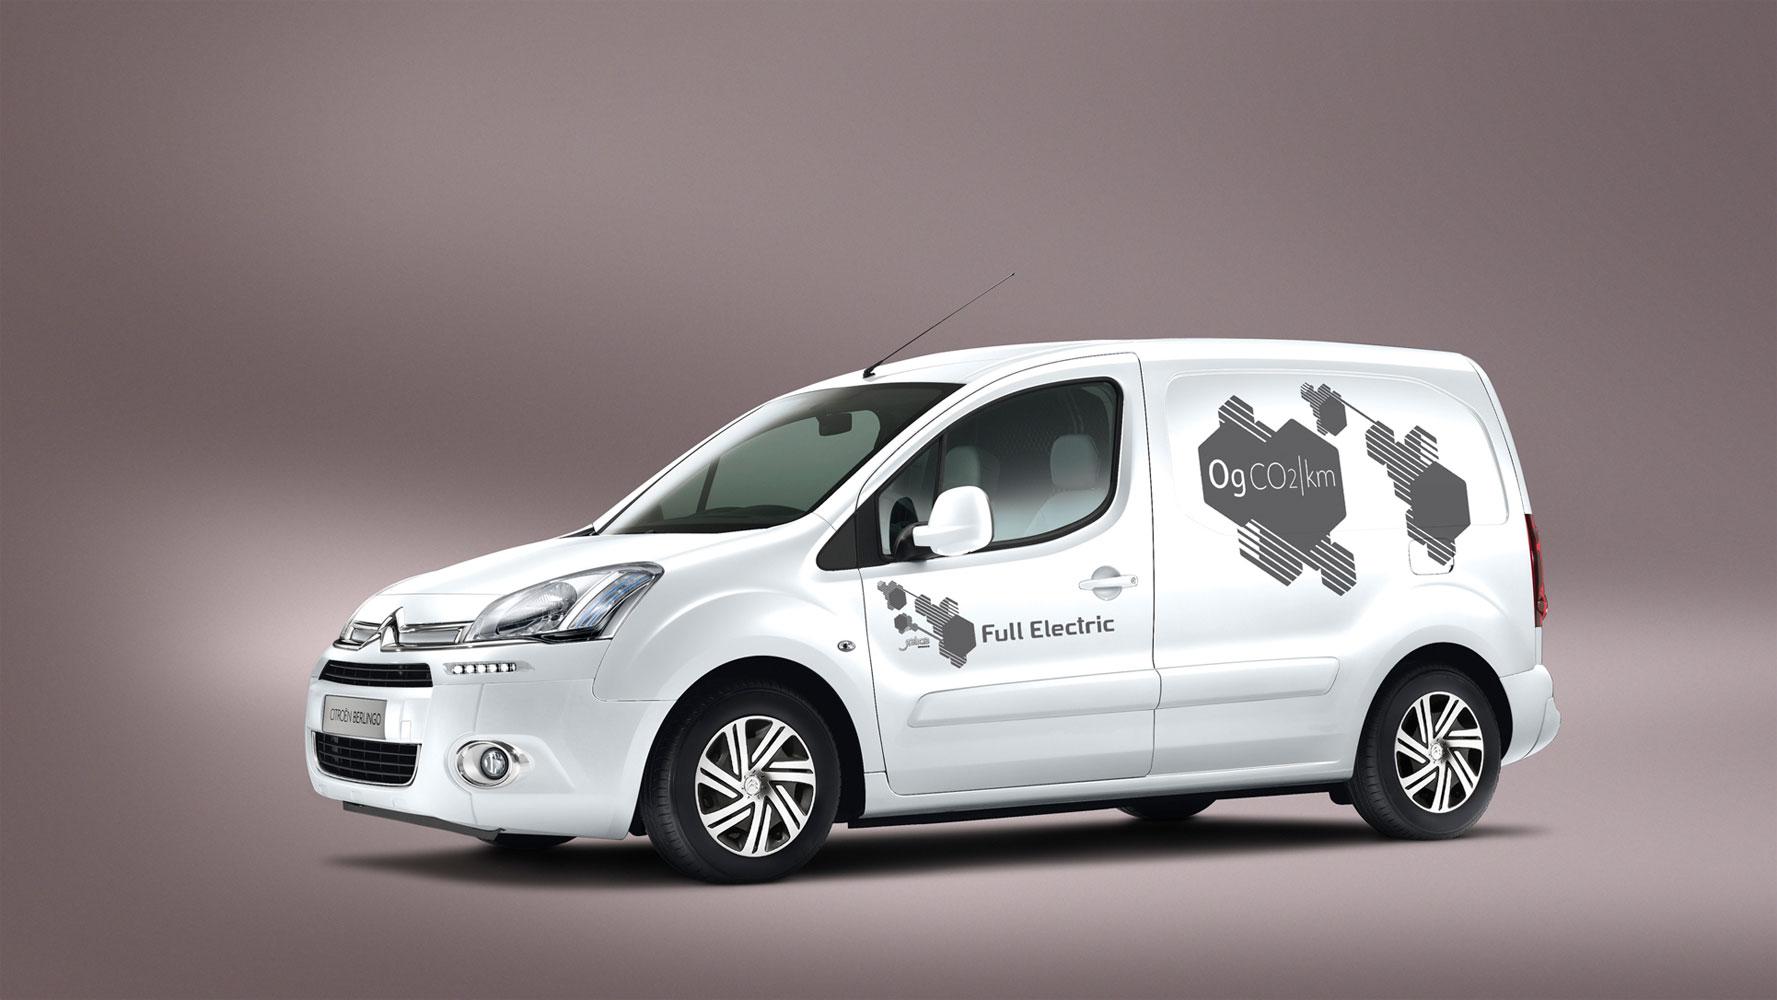 Citroën Berlingo Electrique feiert Weltpremiere auf der IAA Nutzfahrzeuge